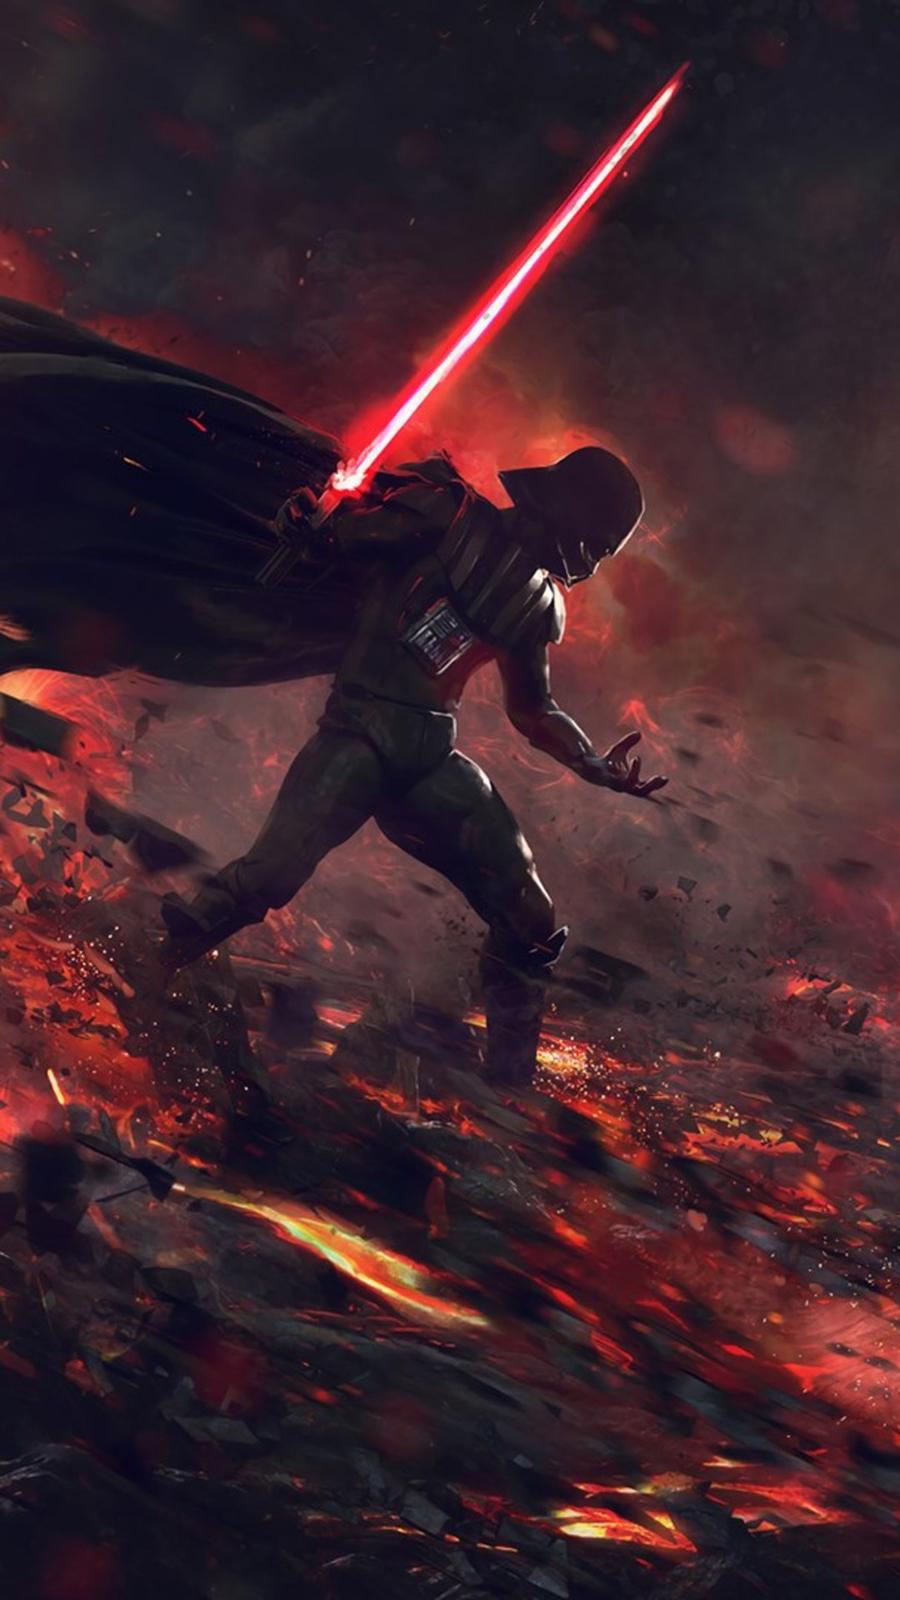 Ahsoka Tano Vs Darth Vader Image Wallpaper